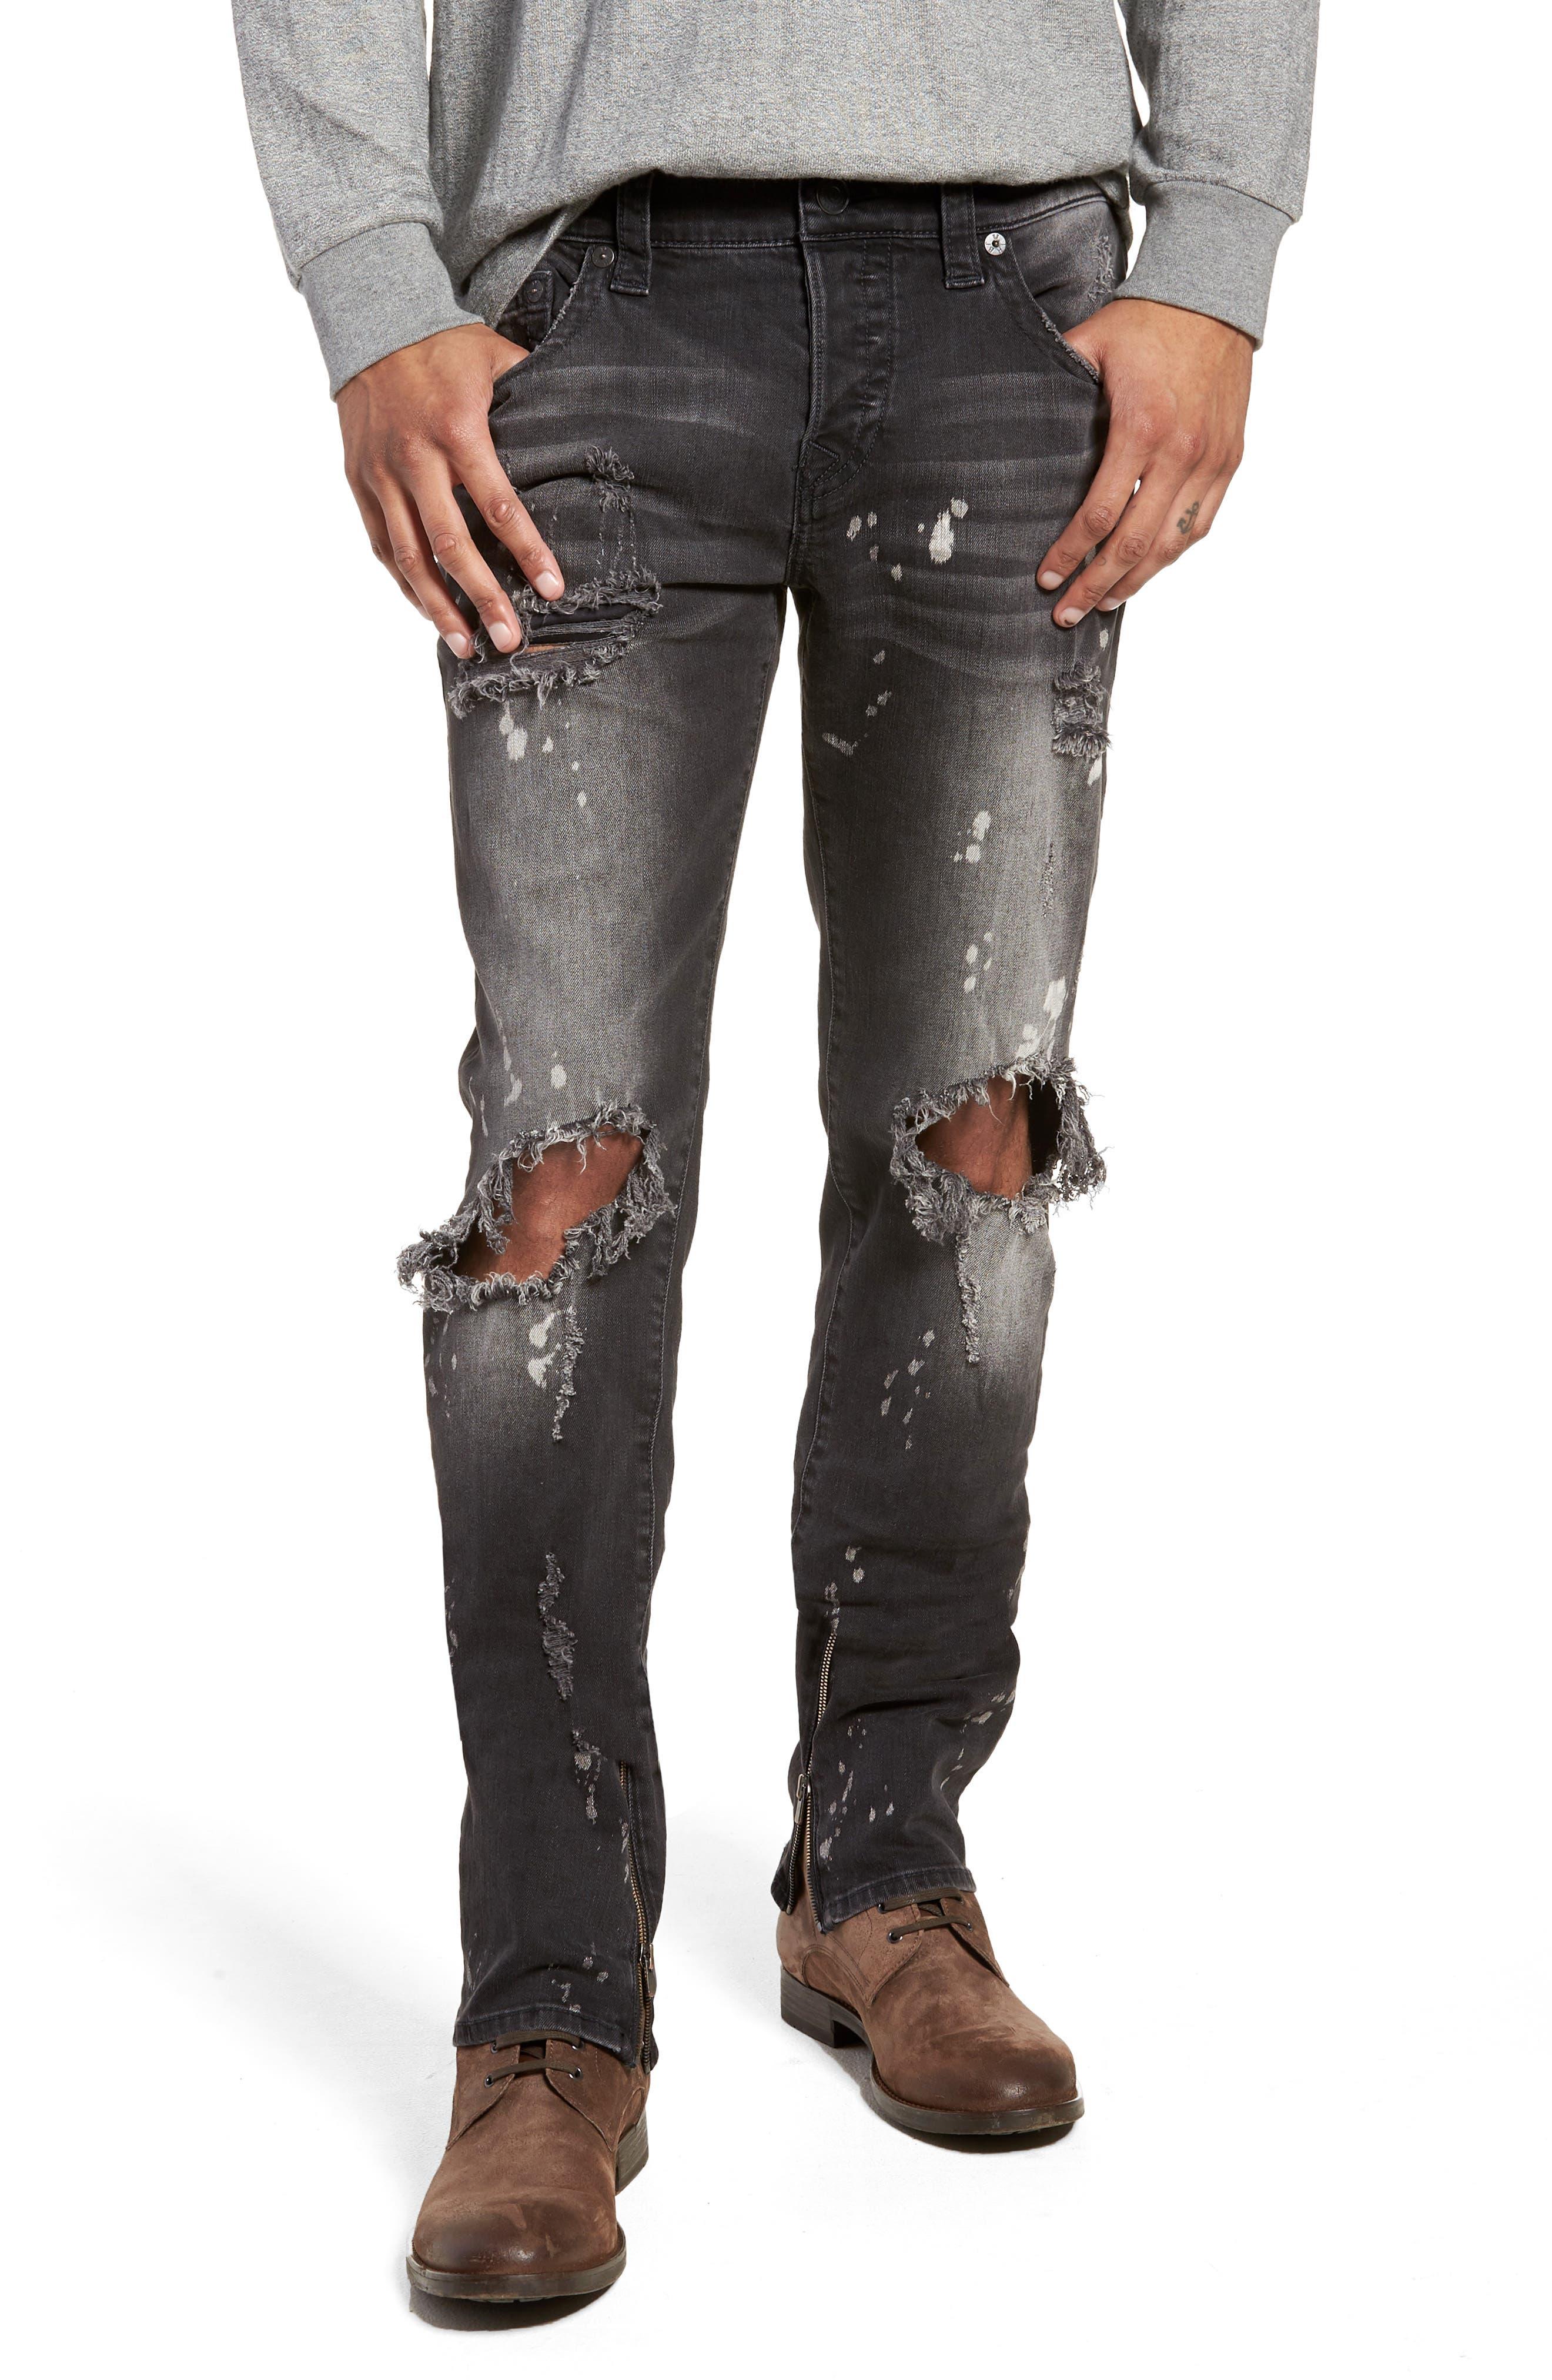 True Religion Brand Jeans Rocco Skinny Fit Jeans (Cyber Rebel)